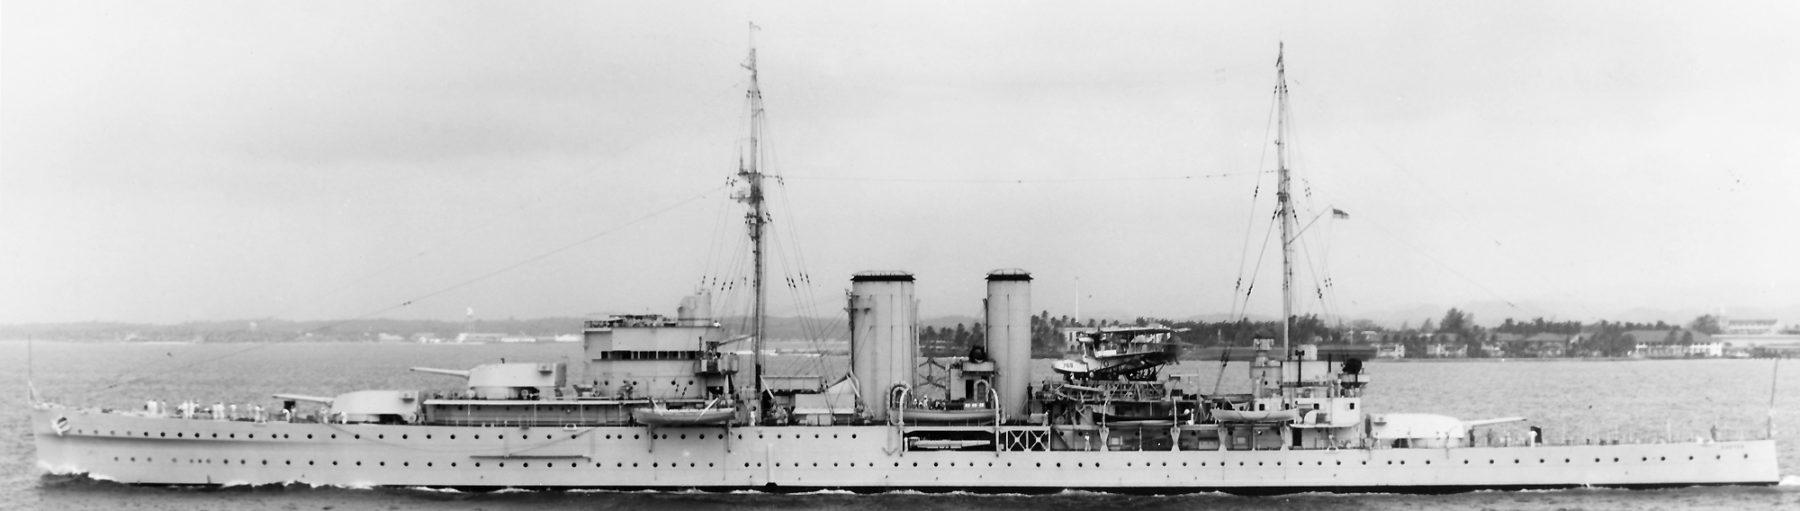 York class cruisers